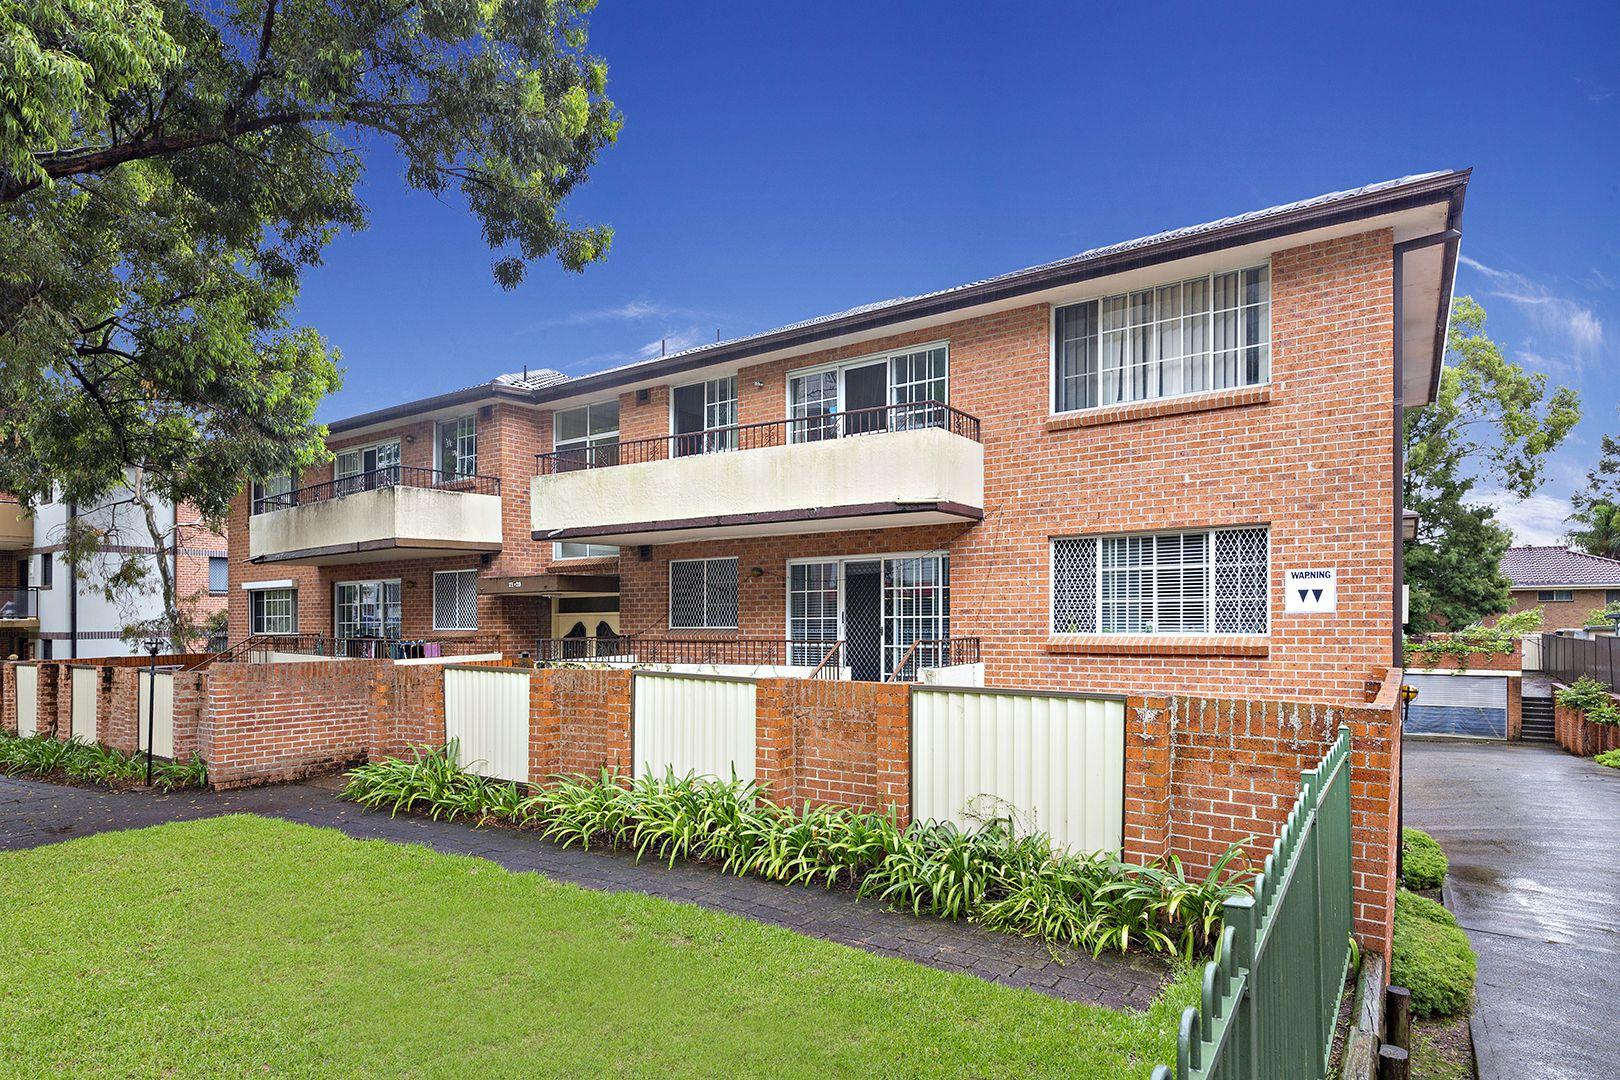 5/21-23 Wilga Street, Burwood NSW 2134, Image 0